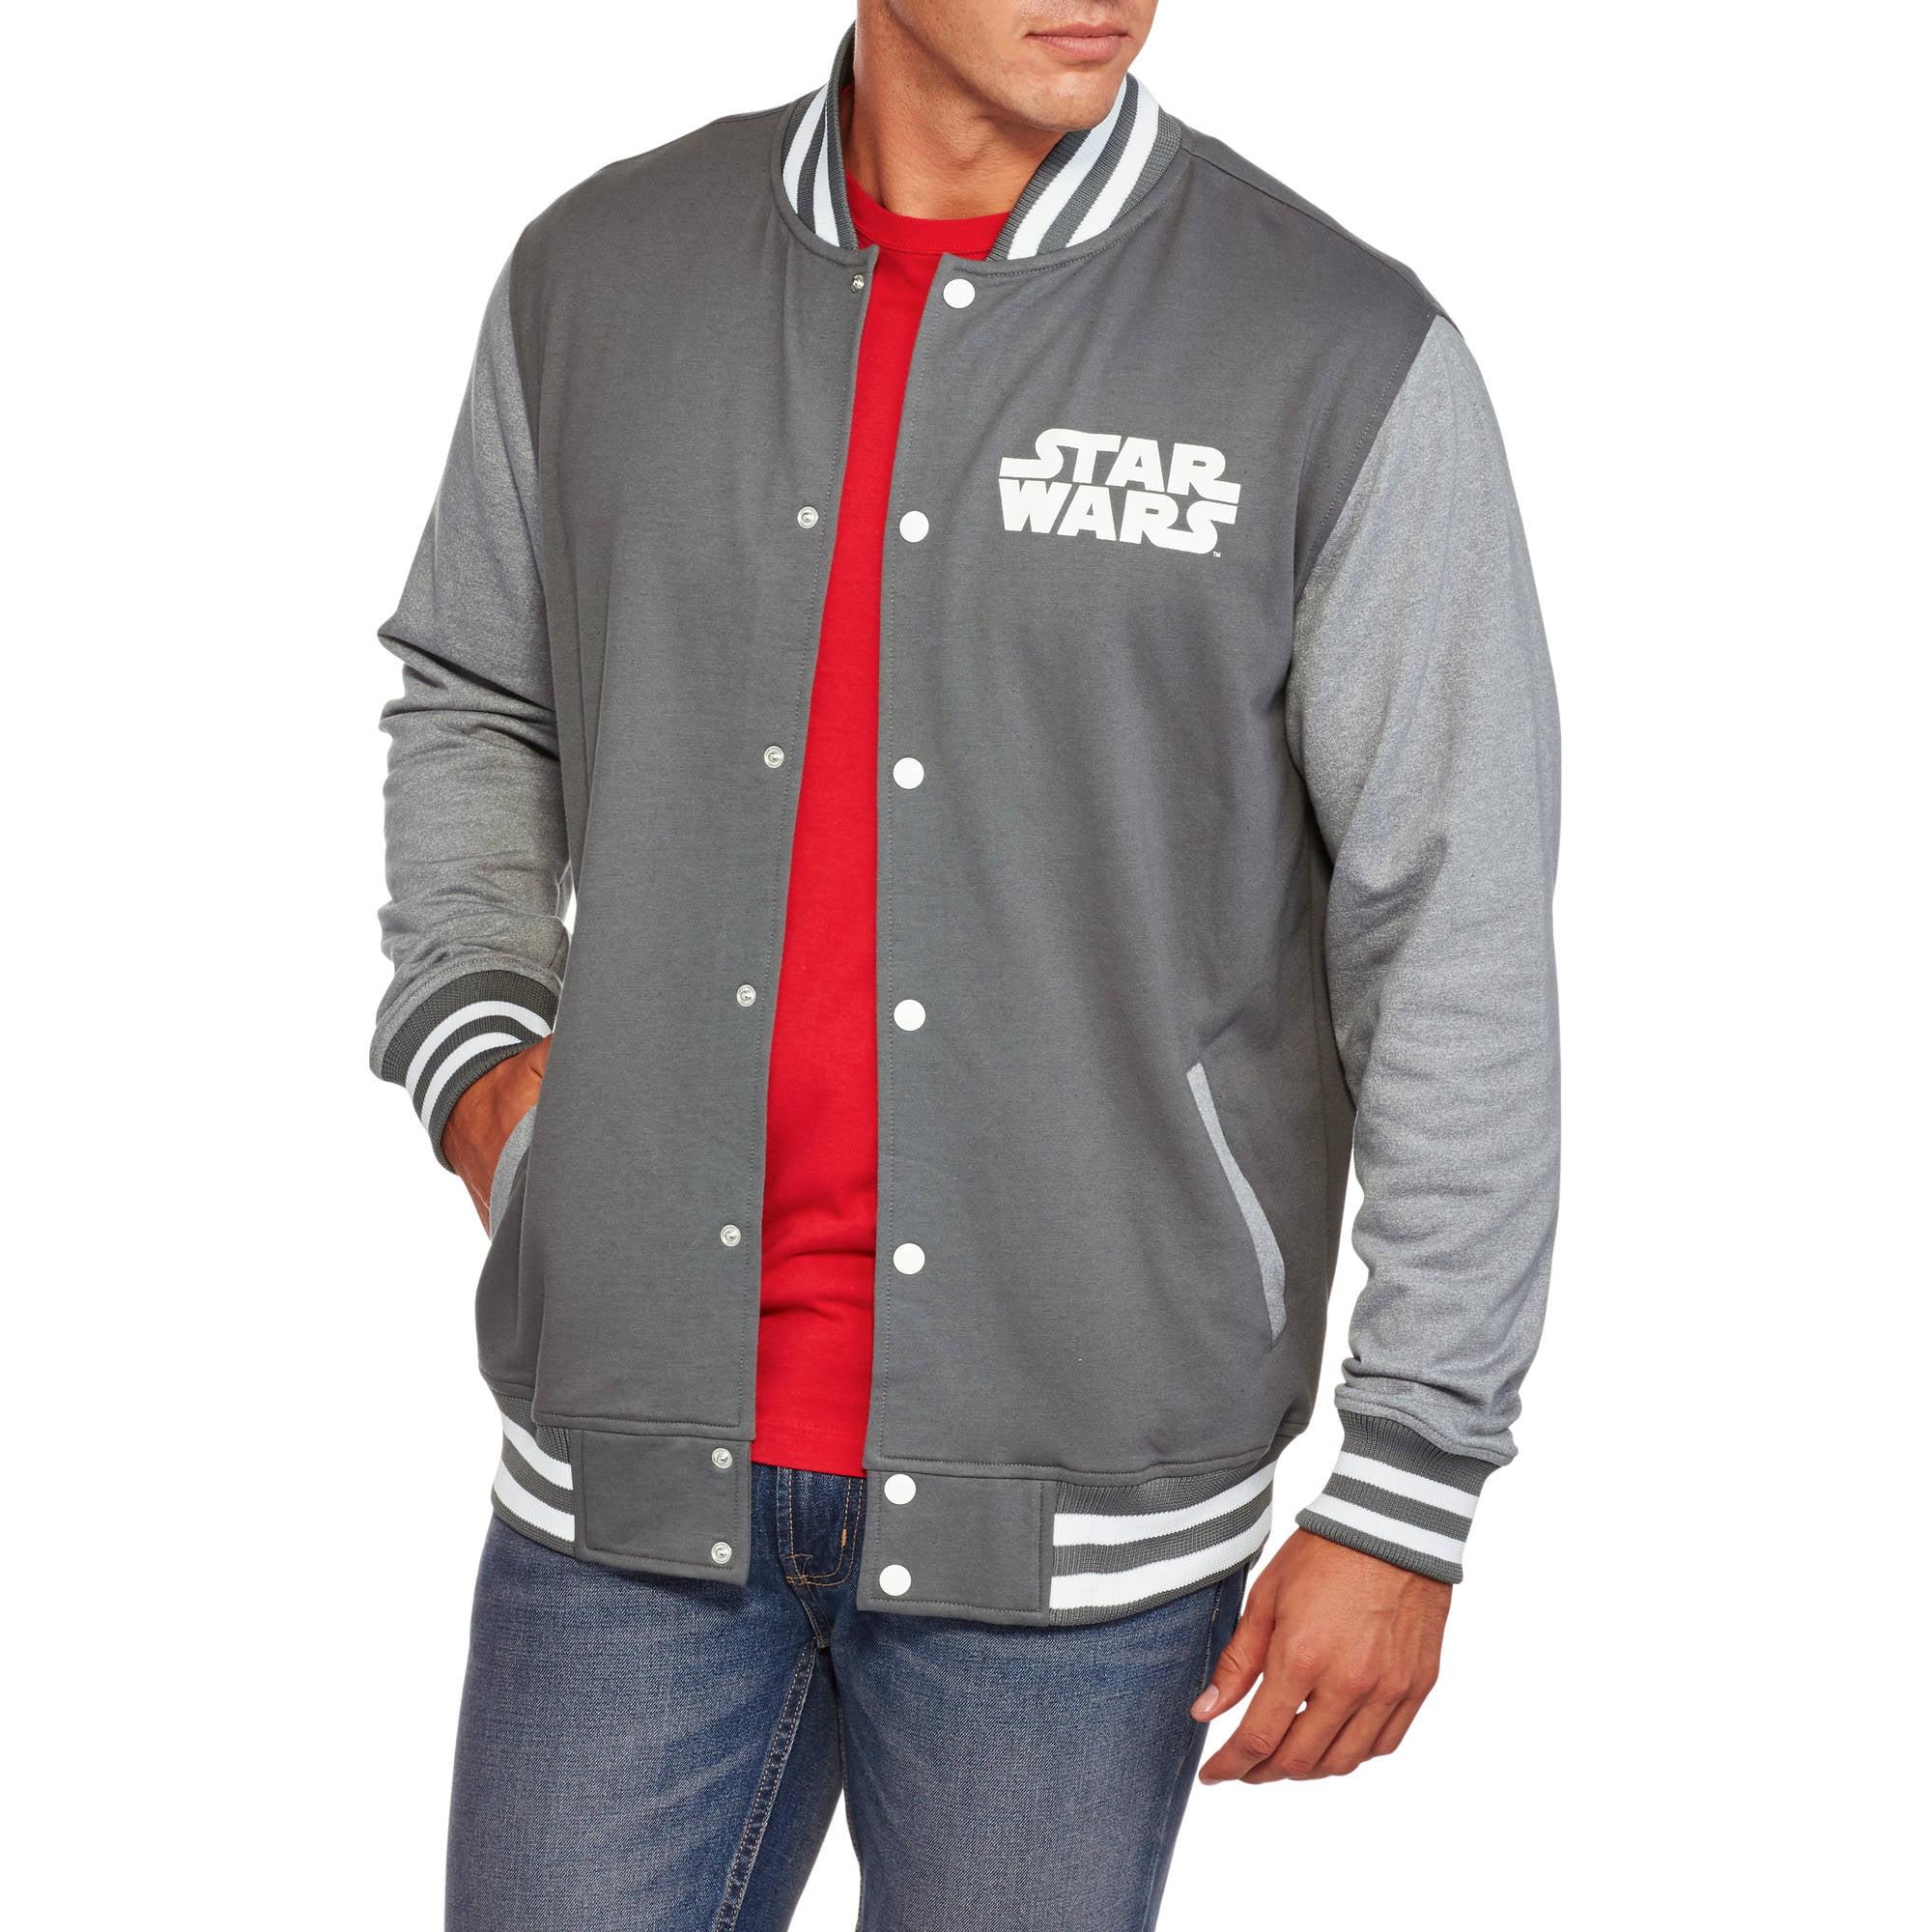 Star Wars Big Men's Varsity Jacket, 2XL